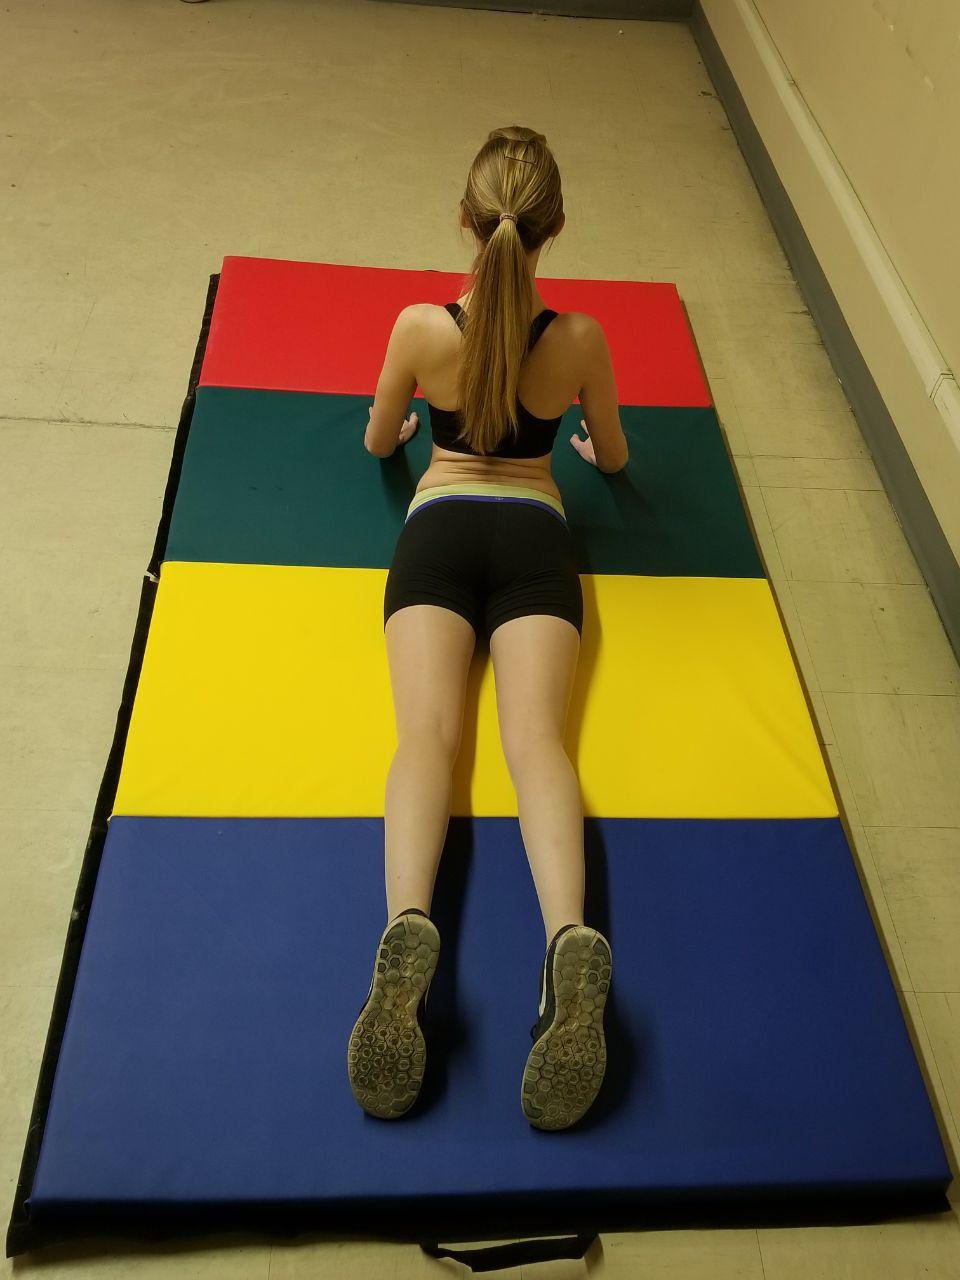 New 8 Ft X 4 Ft X 2 In Folding Yoga Mat Gym Mat Ymr4